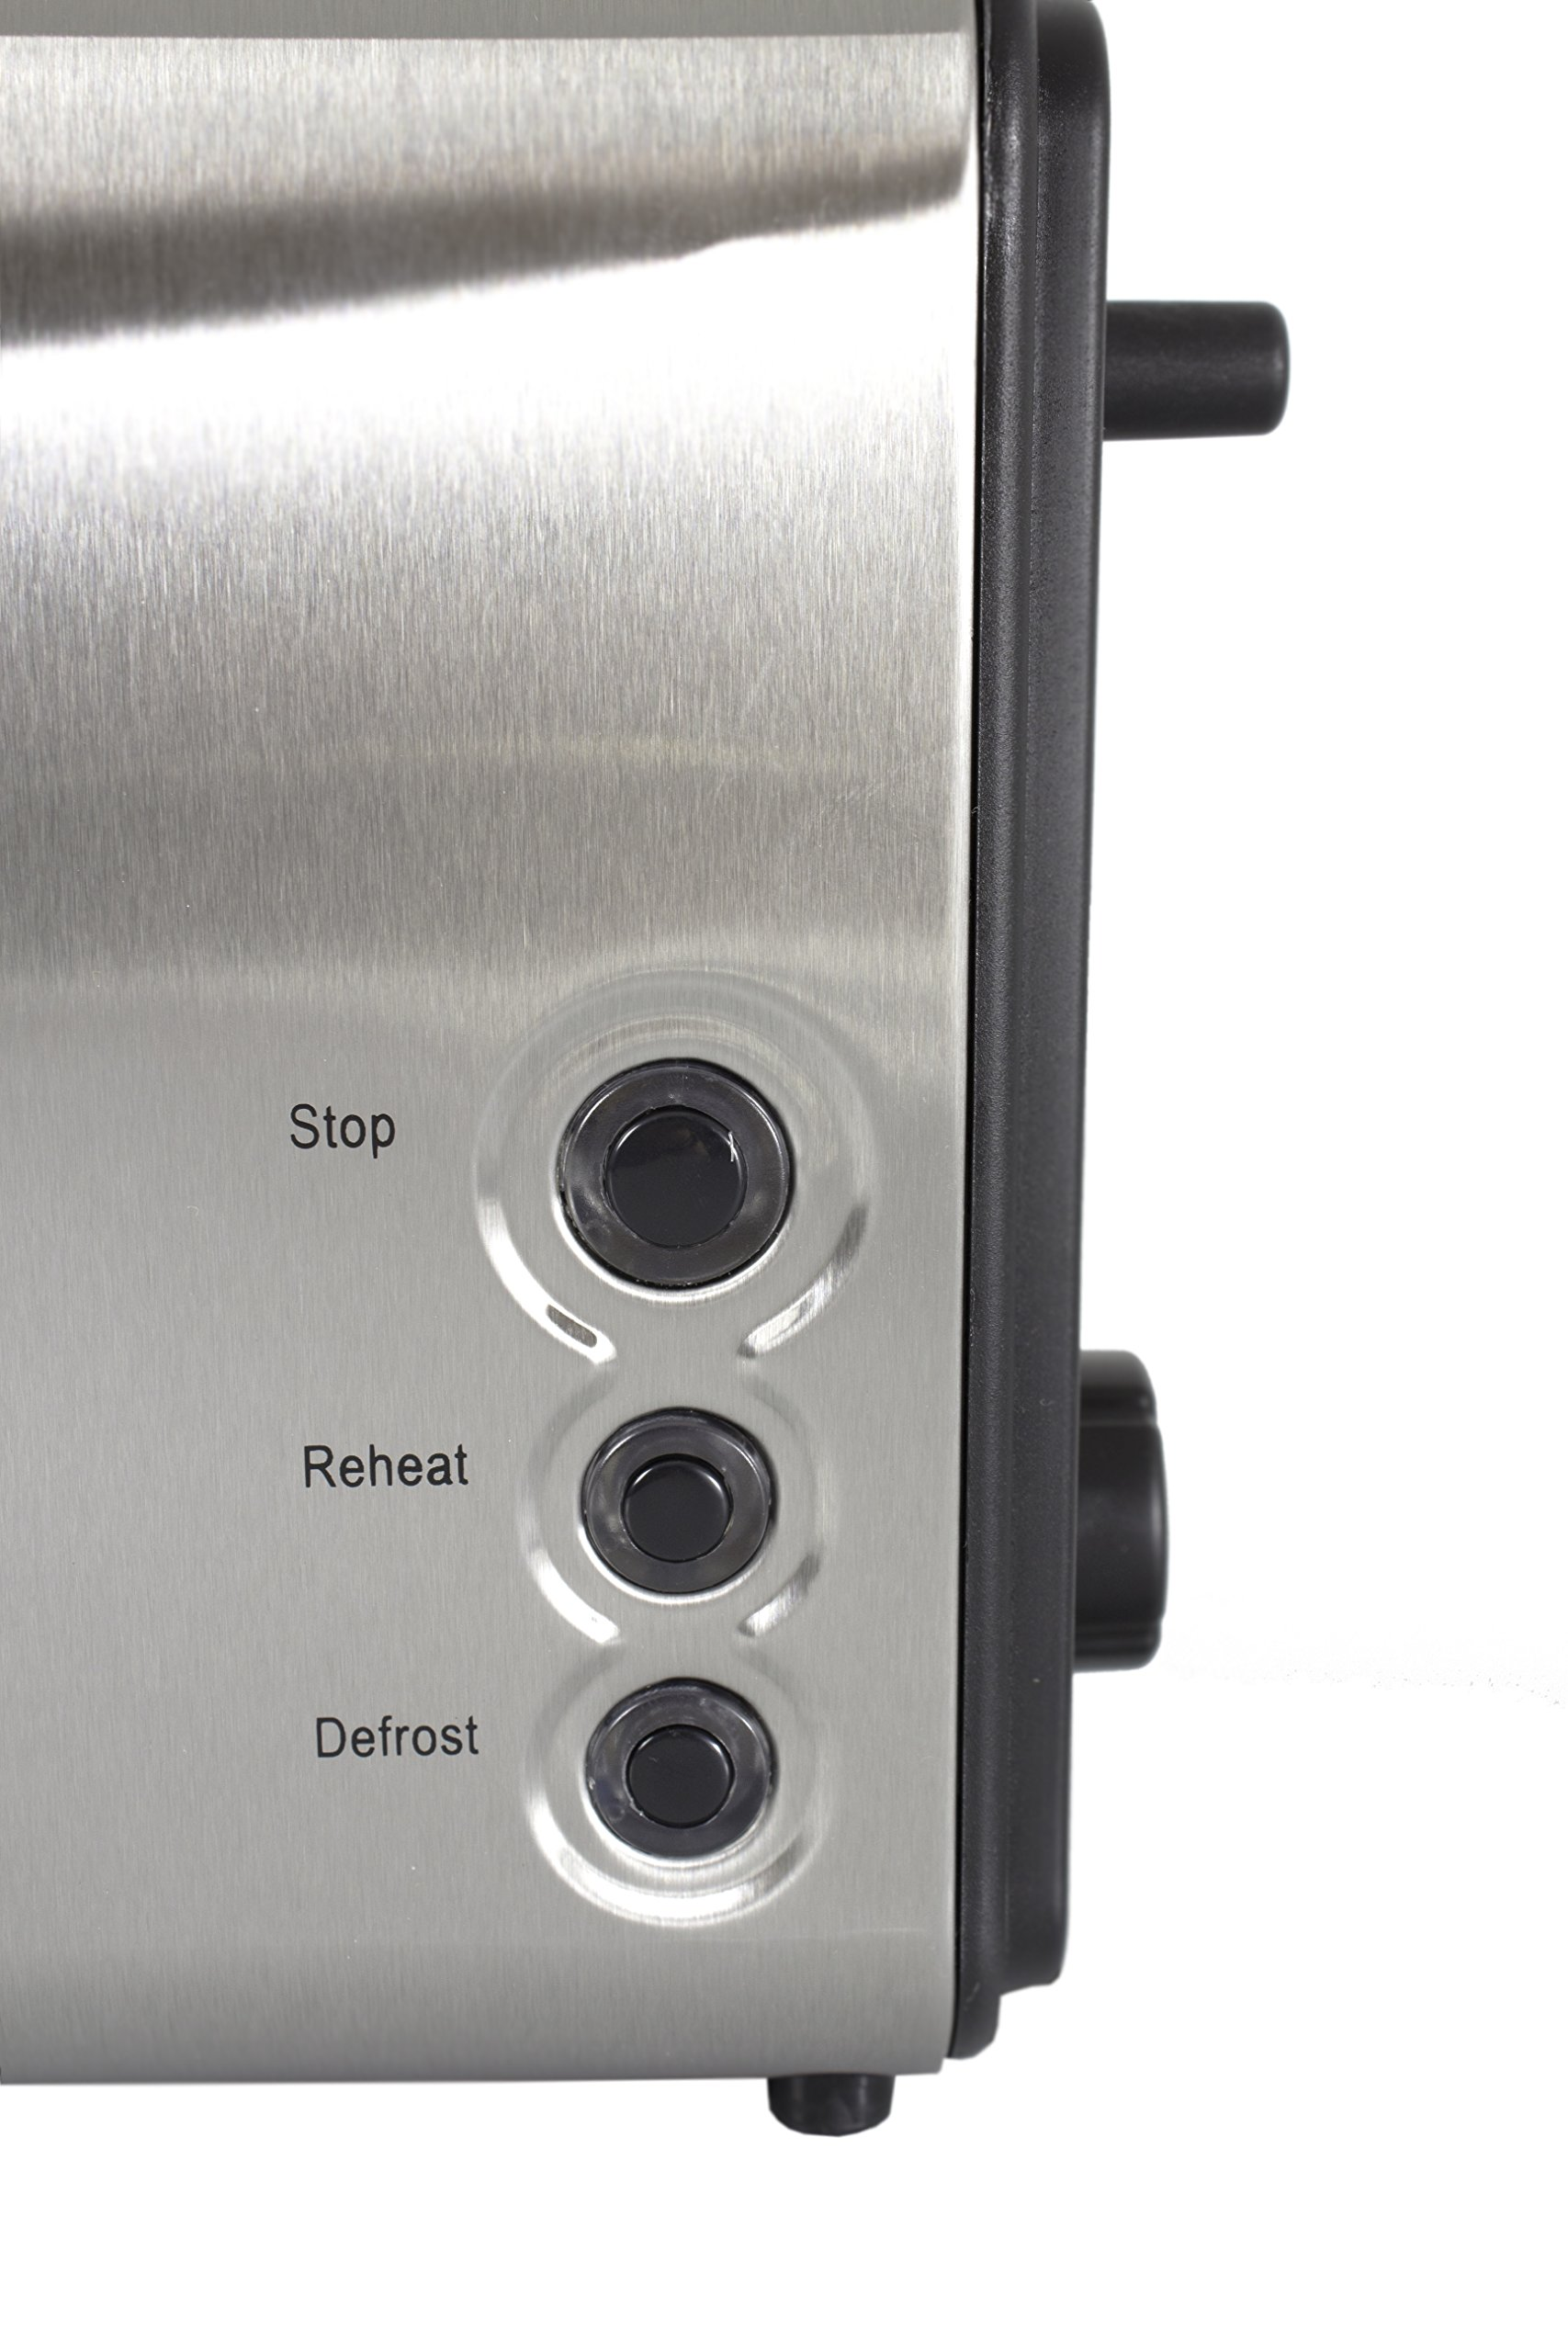 SUNTEC-Langschlitz-Toaster-TOA-9578-1-langer-Toastschlitz-auch-fr-ganze-Brotscheiben-Brtchenaufsatz-3-Funktionen-Krmelschublade-max-1050-Watt